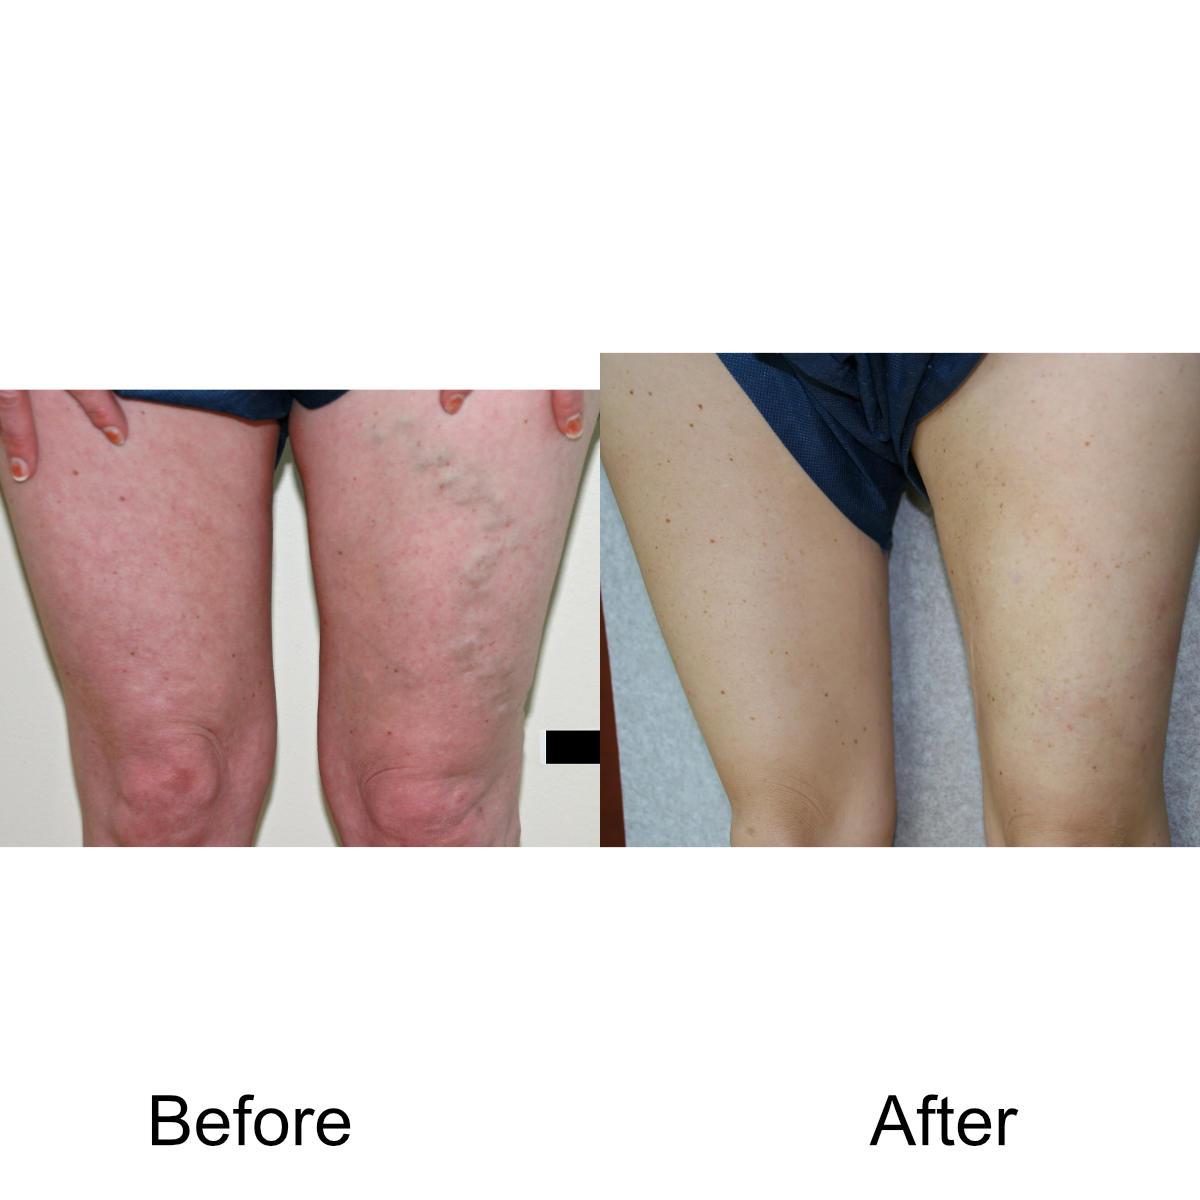 varicose-veins-comparison-06